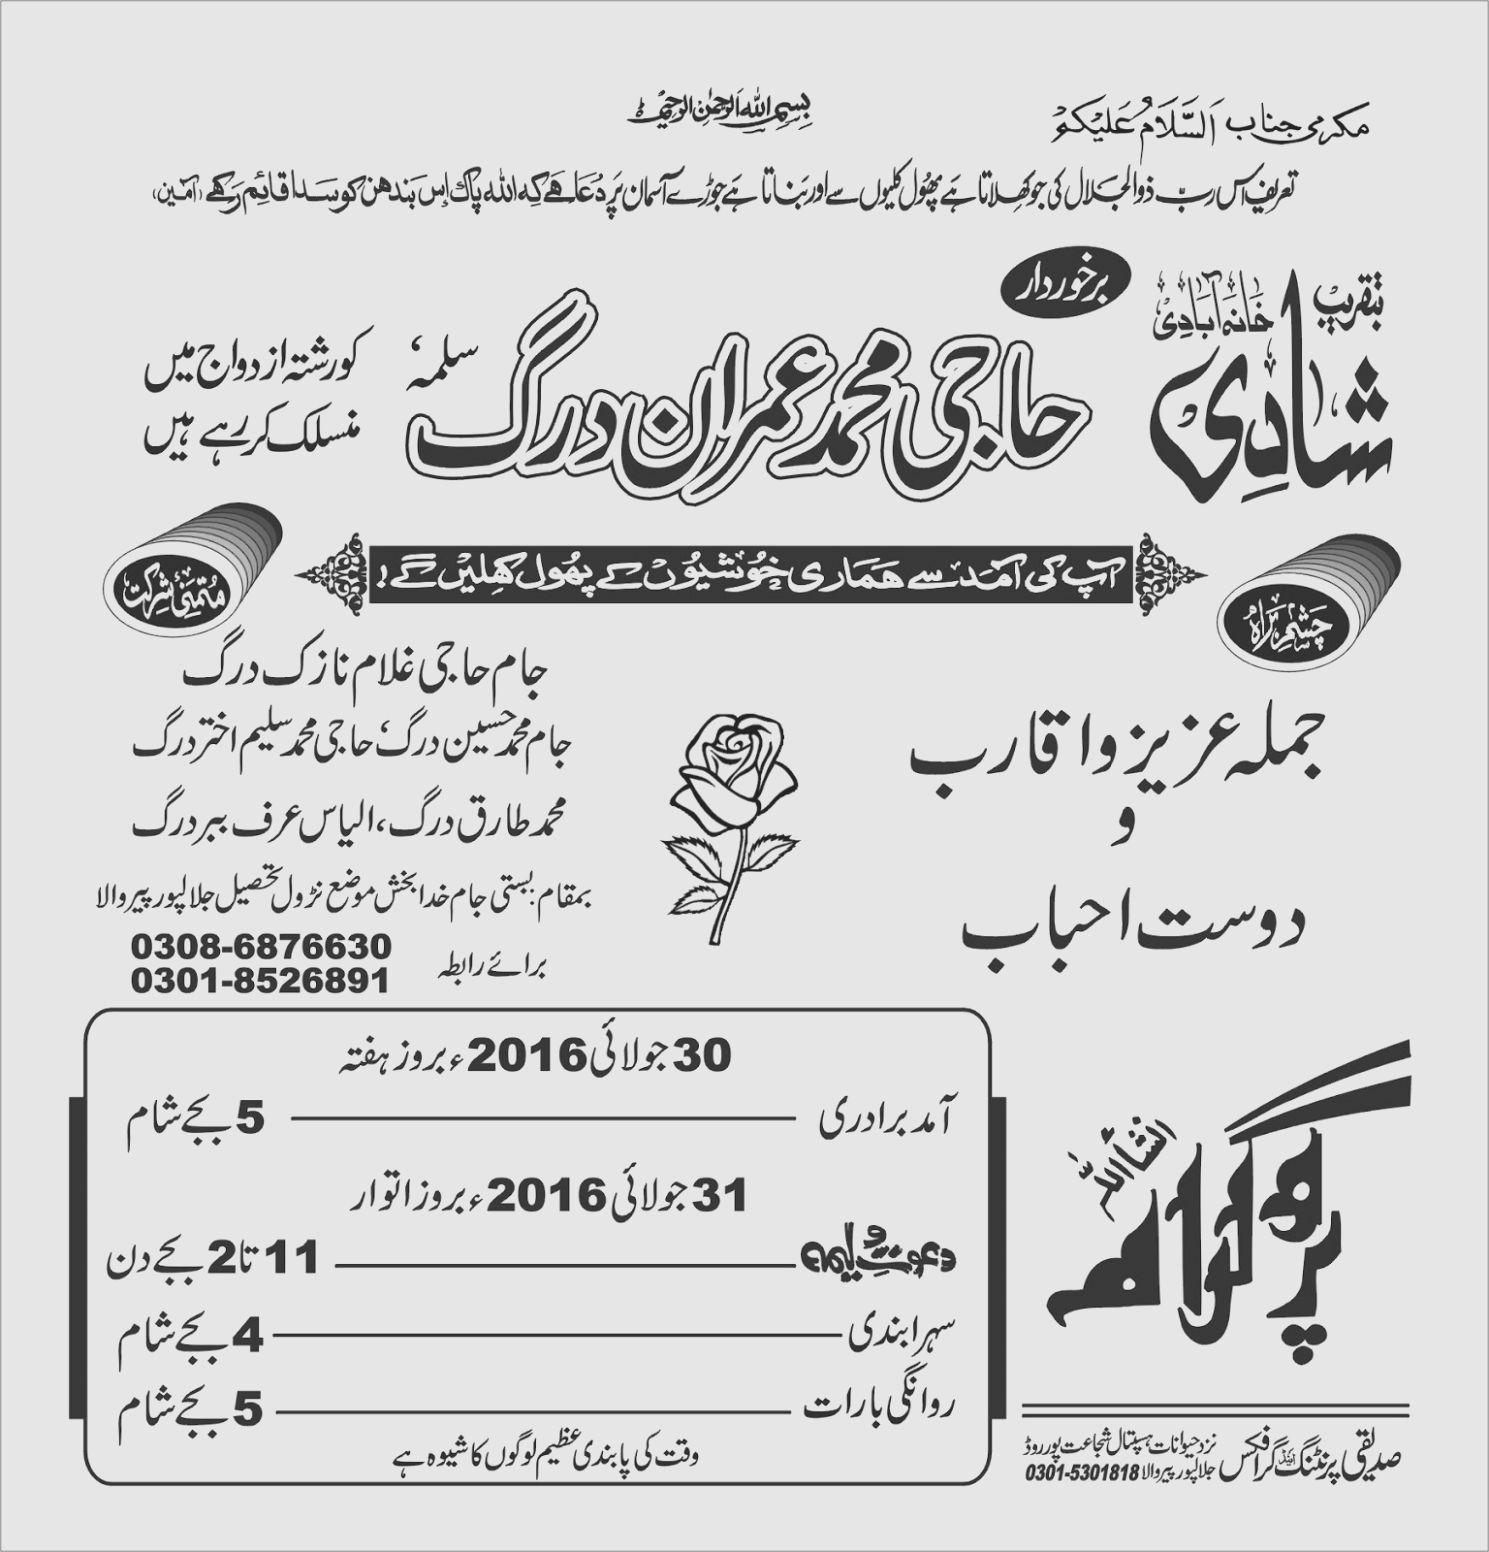 4 Urdu Marriage Card Matter In 2021 Marriage Cards Wedding Cards Shadi Card